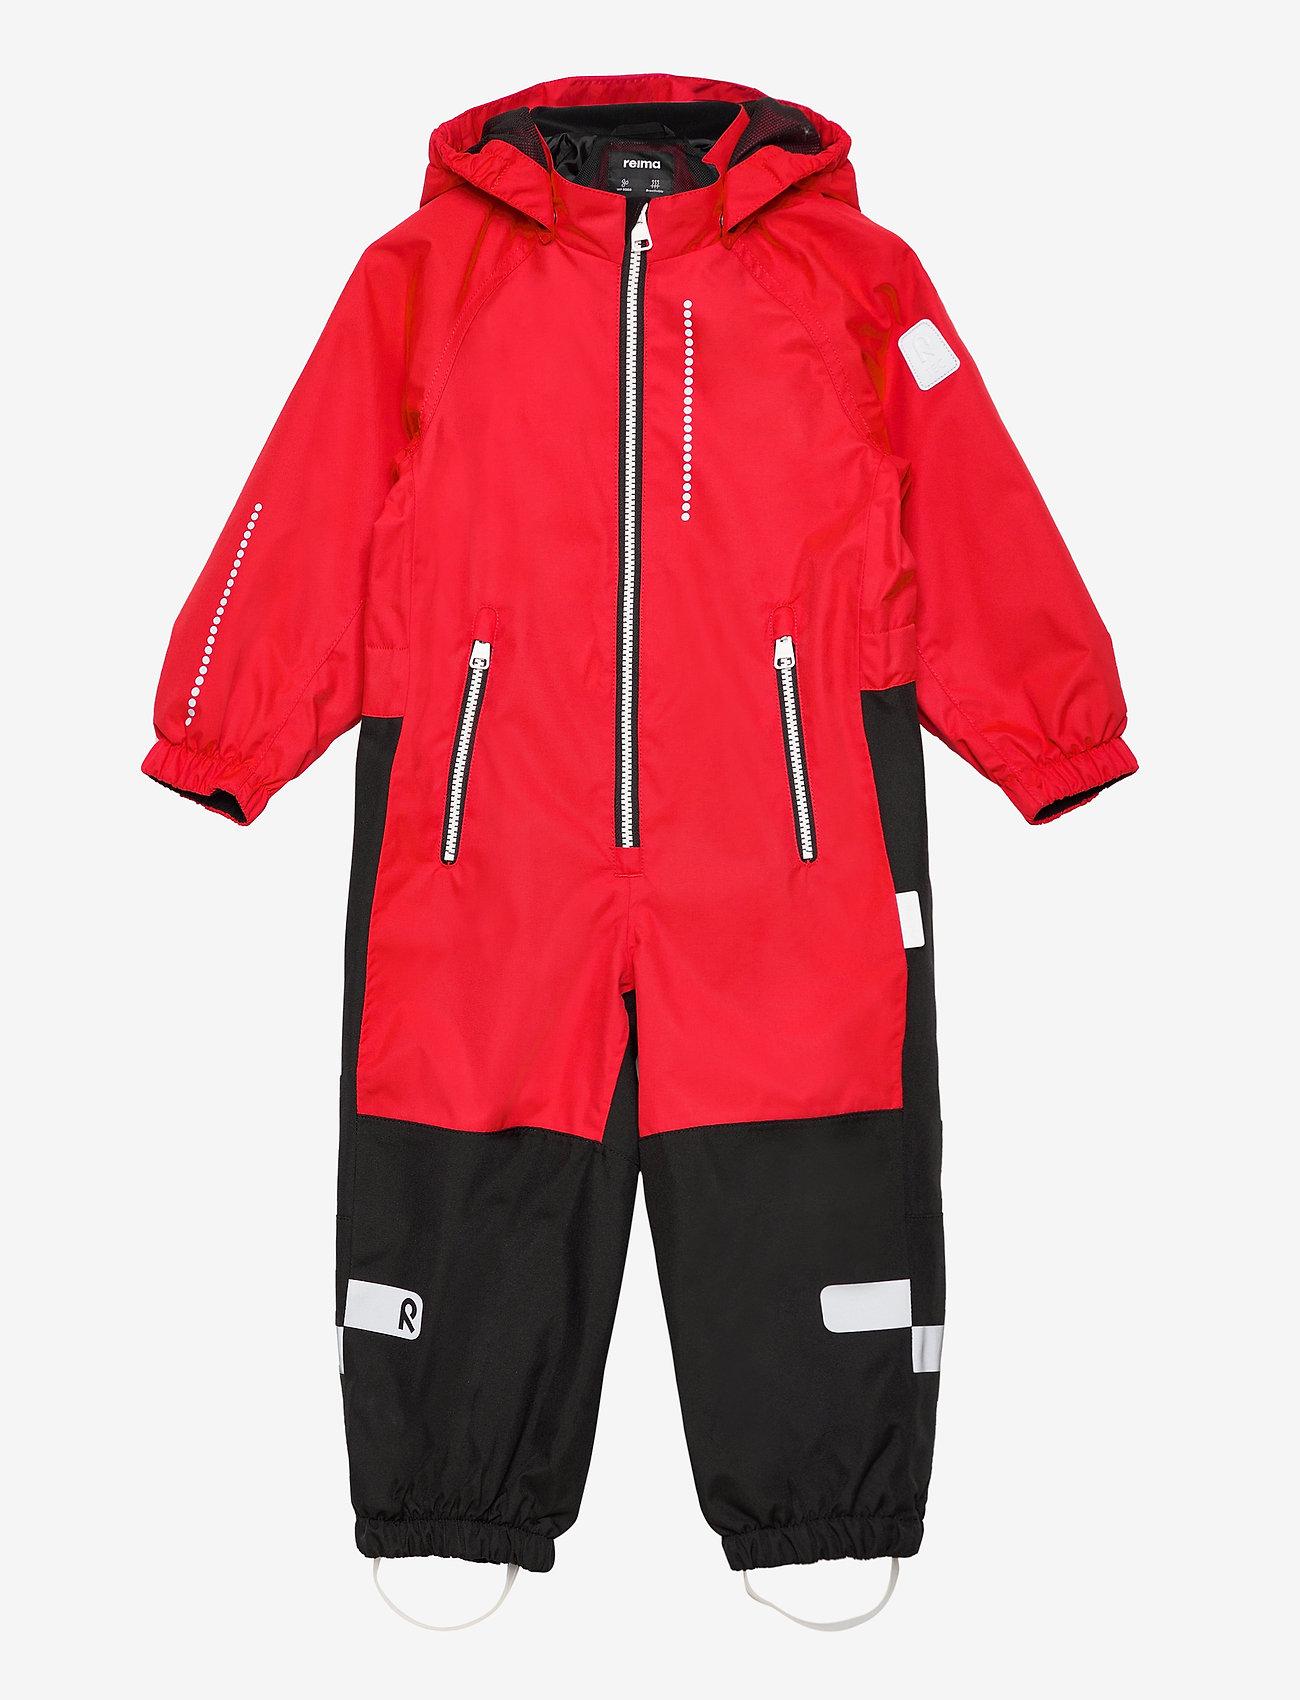 Reima - Kapelli - shell clothing - tomato red - 0